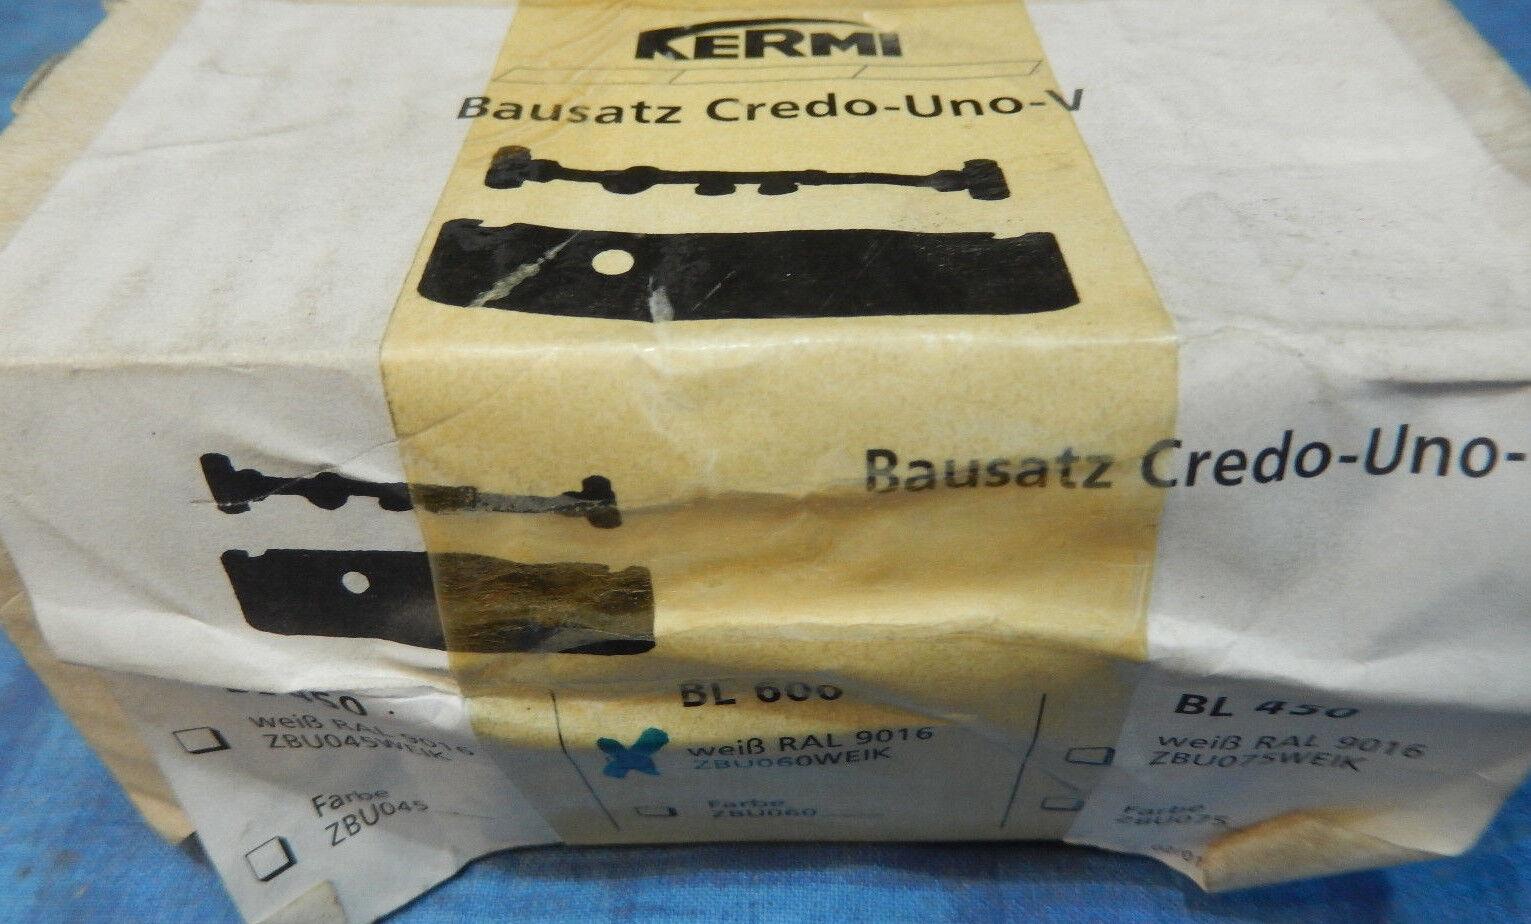 KERMI Bausatz Bausatz Bausatz CROTo-Uno-V BL600 weiss 584ab7